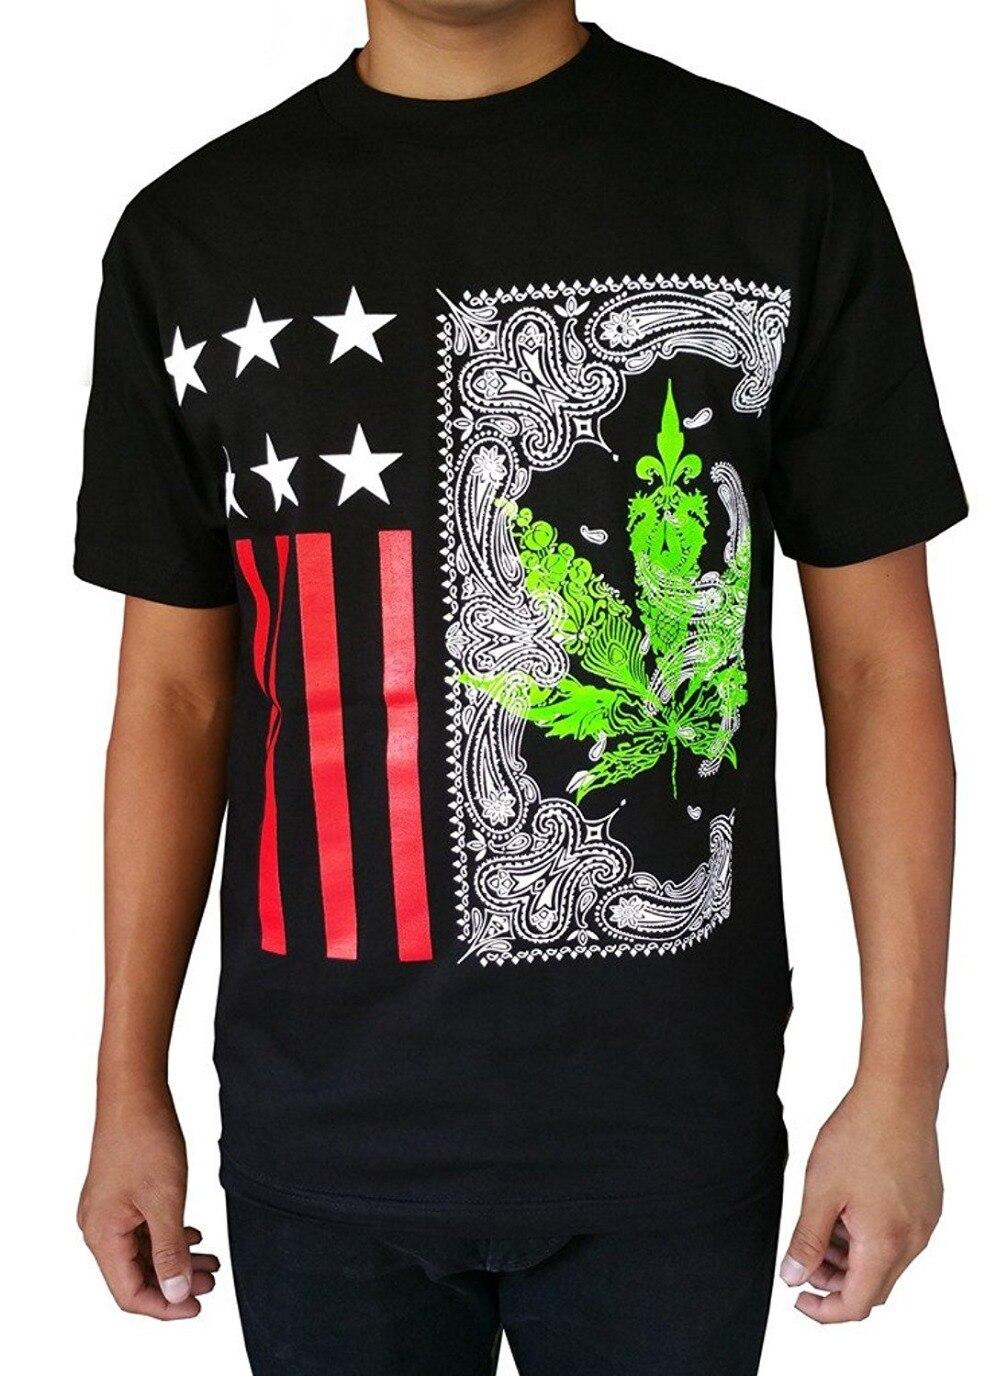 Design t shirt online usa - 2017 New Arrivals New Men 39 S Printed Weed Marijuana Usa Graphic Design T